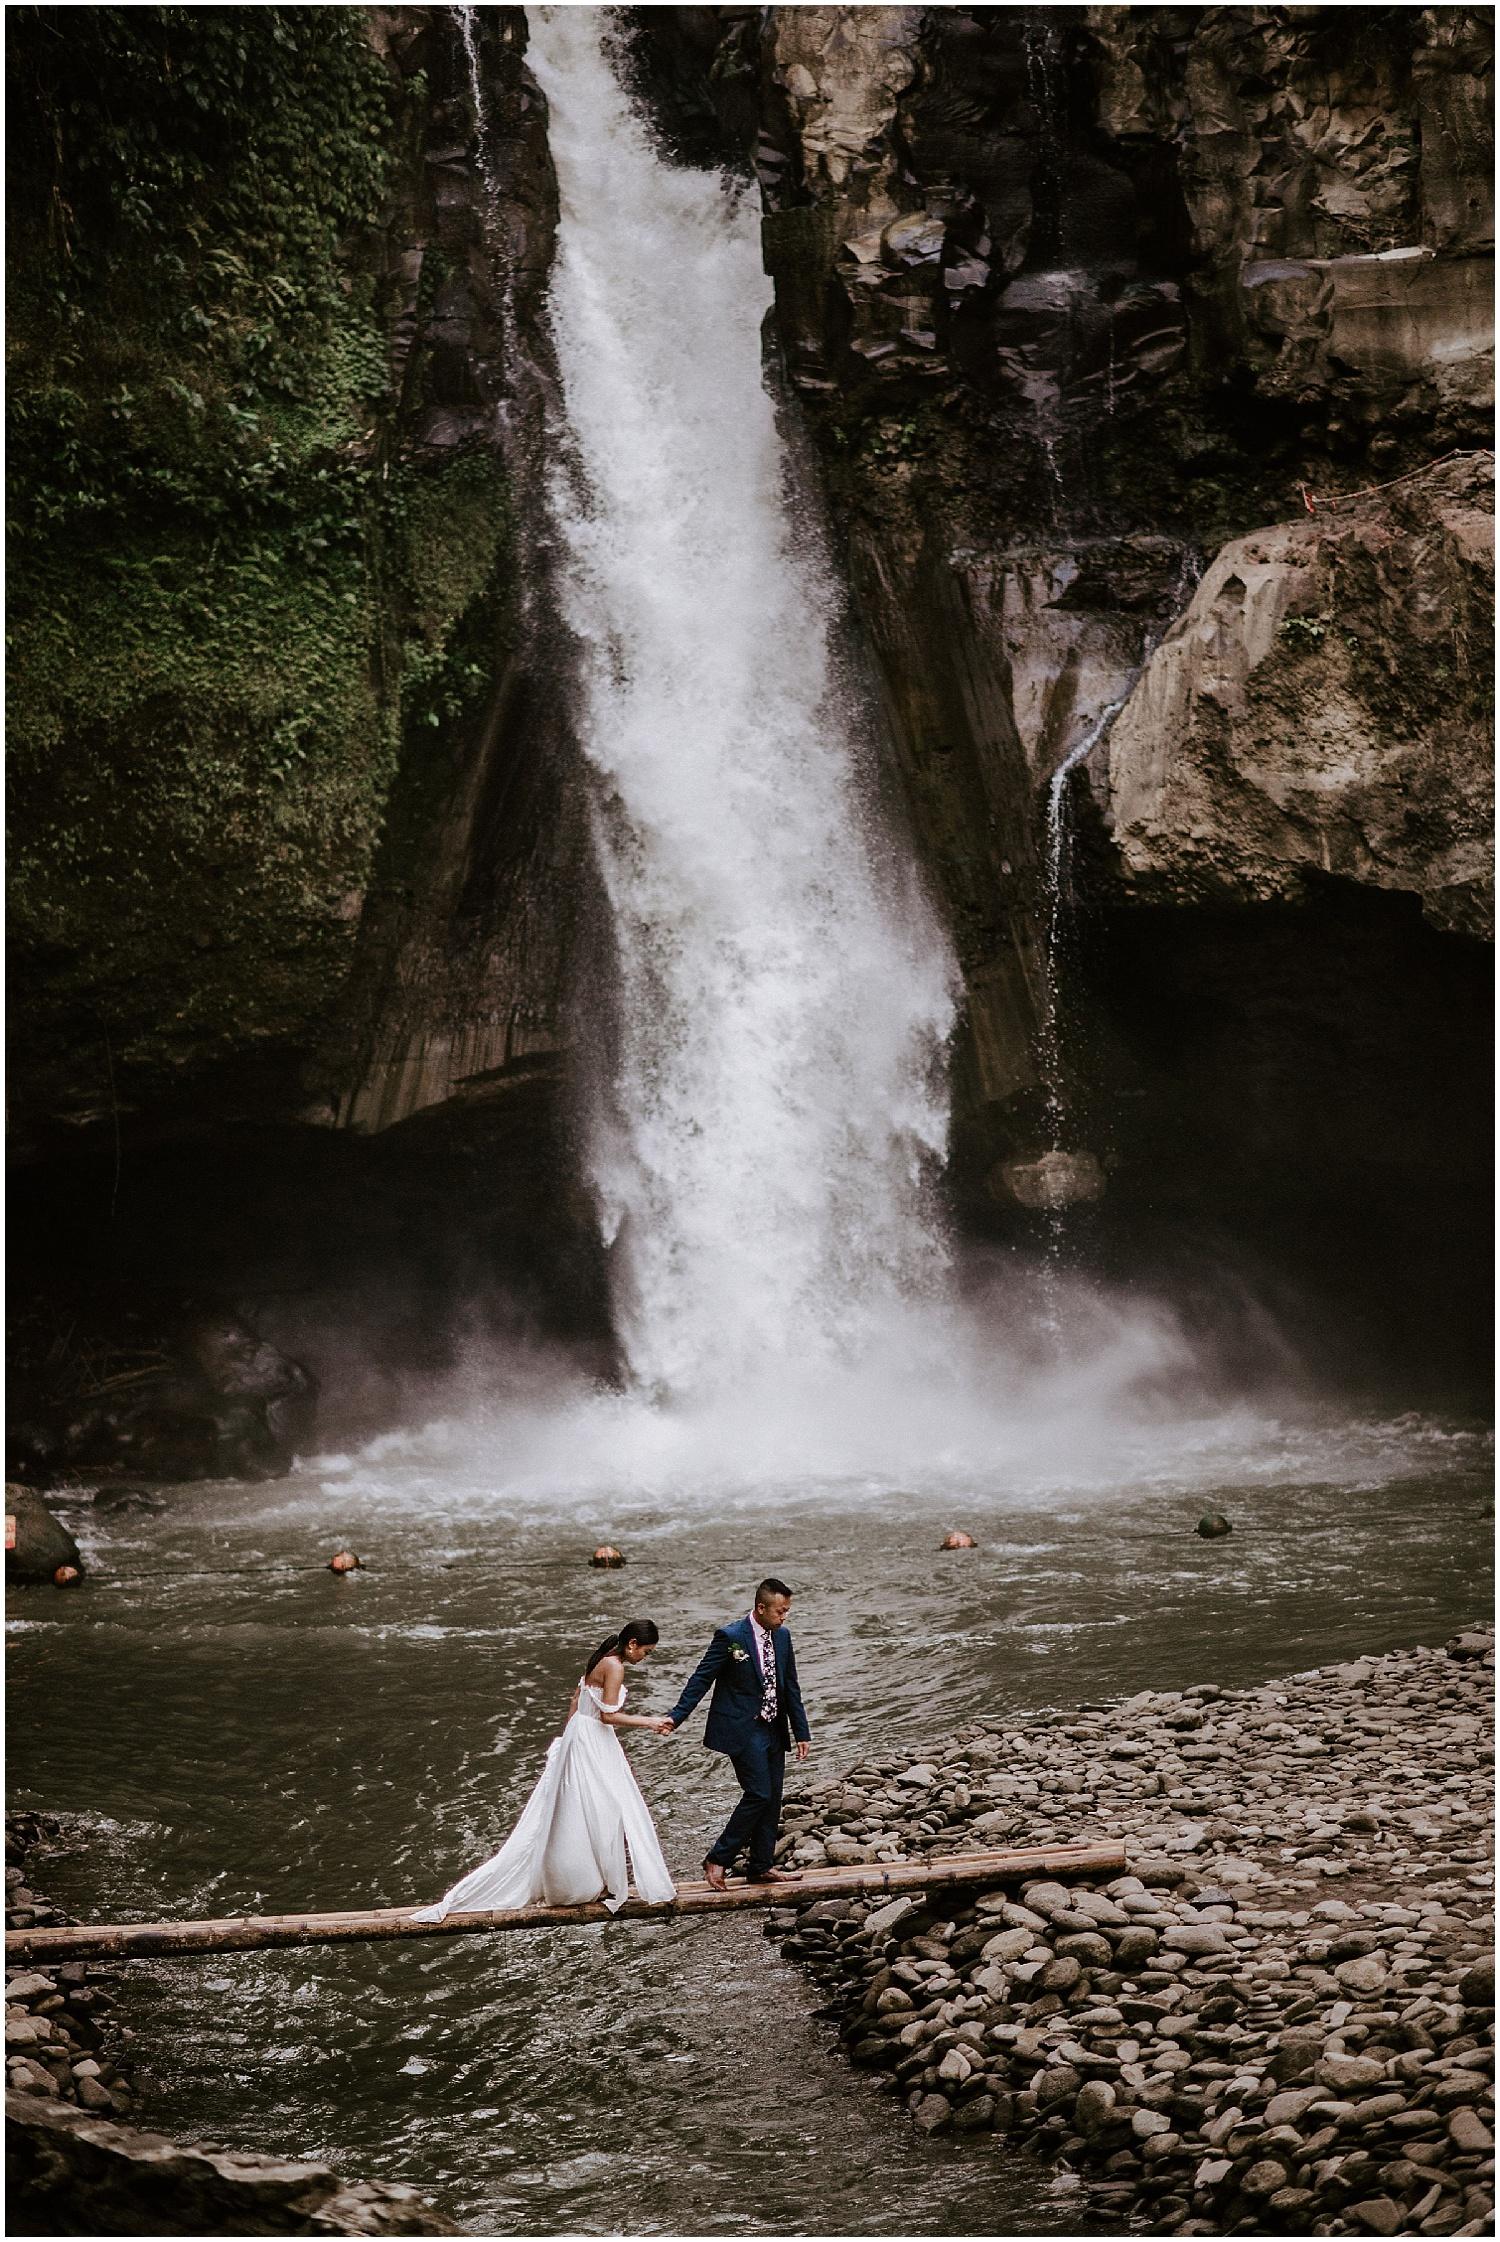 ubud bali tegenungan waterfall elopement photos